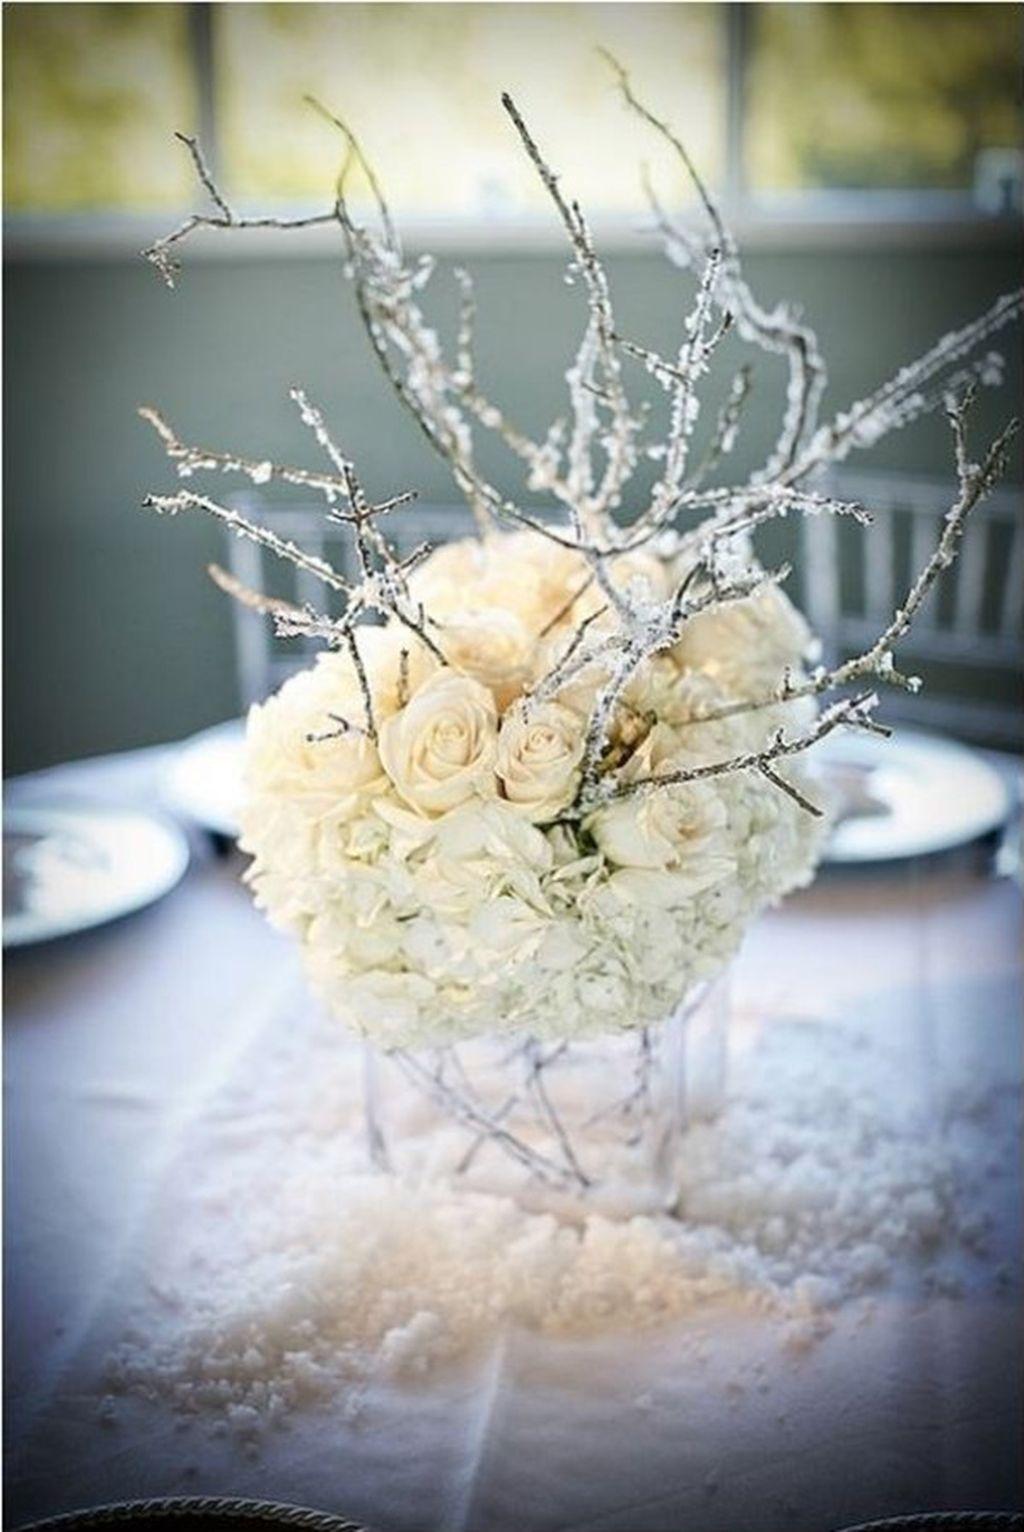 55 Totally Inspiring Winter Wedding Centerpieces Ideas | Winter ...